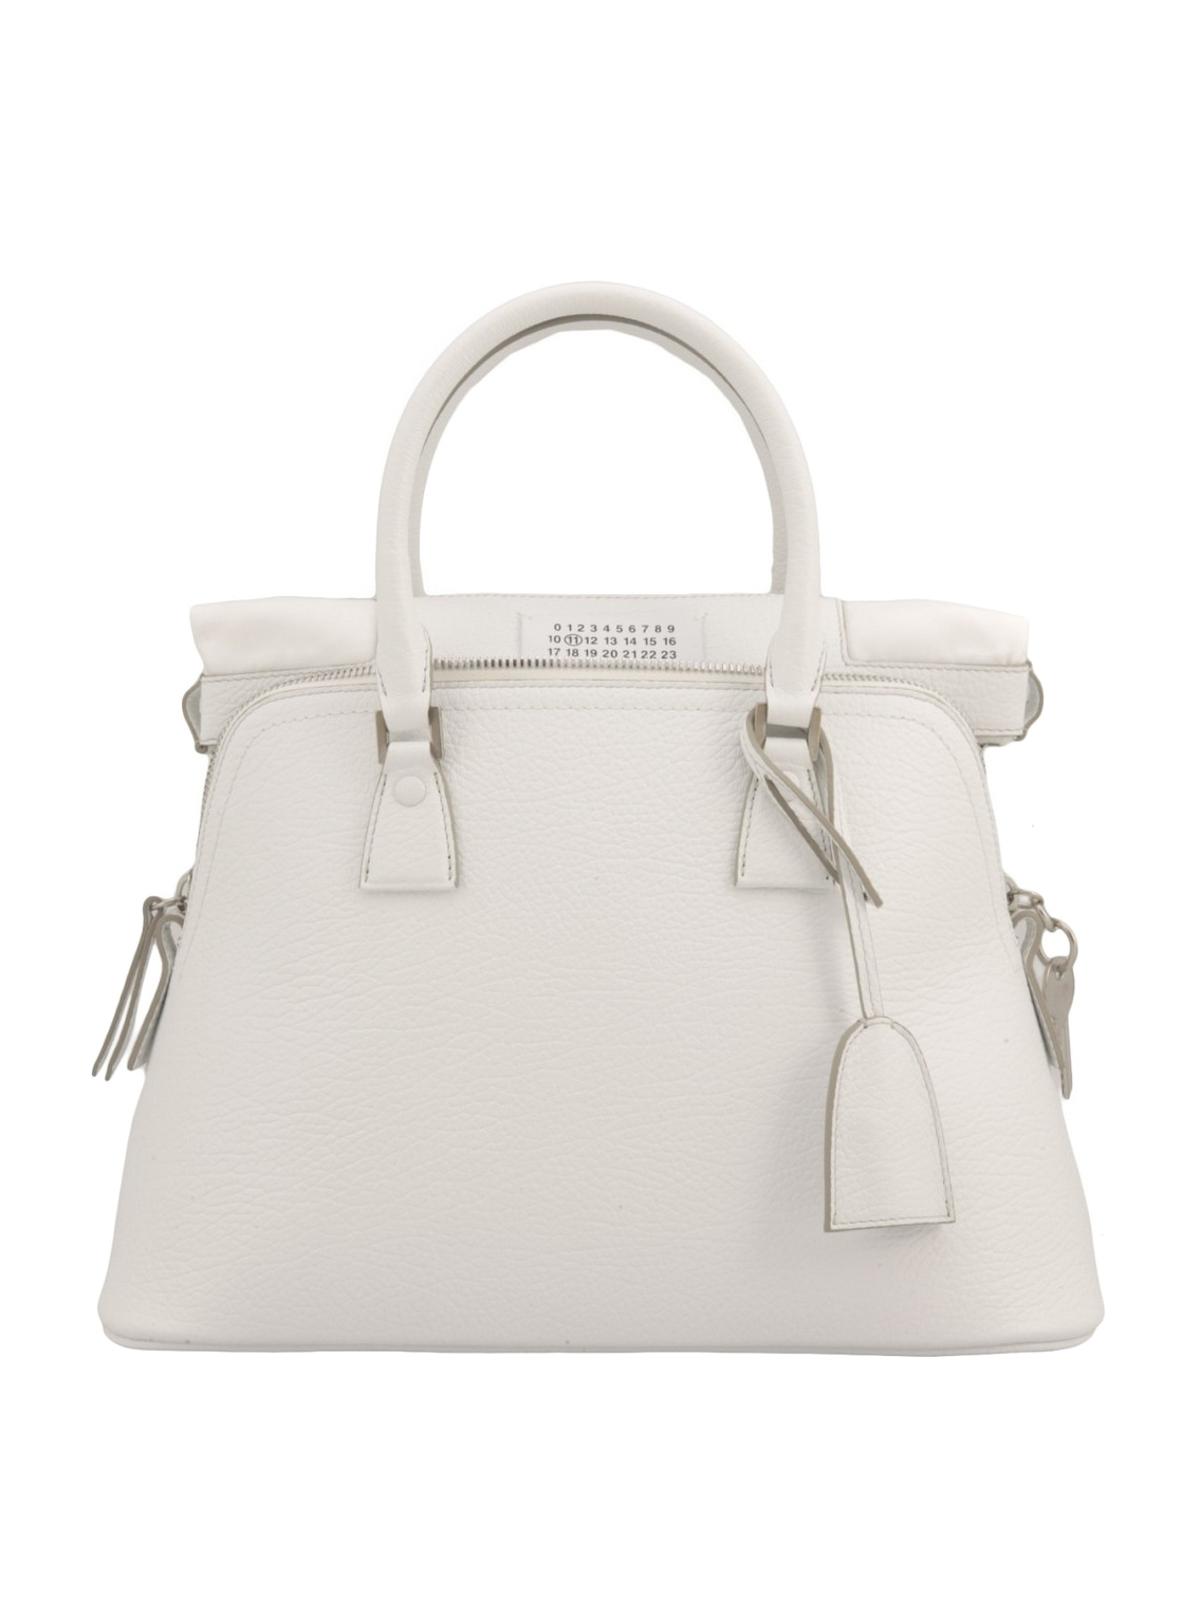 66231975fb7b2 Maison Margiela - 5AC extractable interior bag - totes bags ...